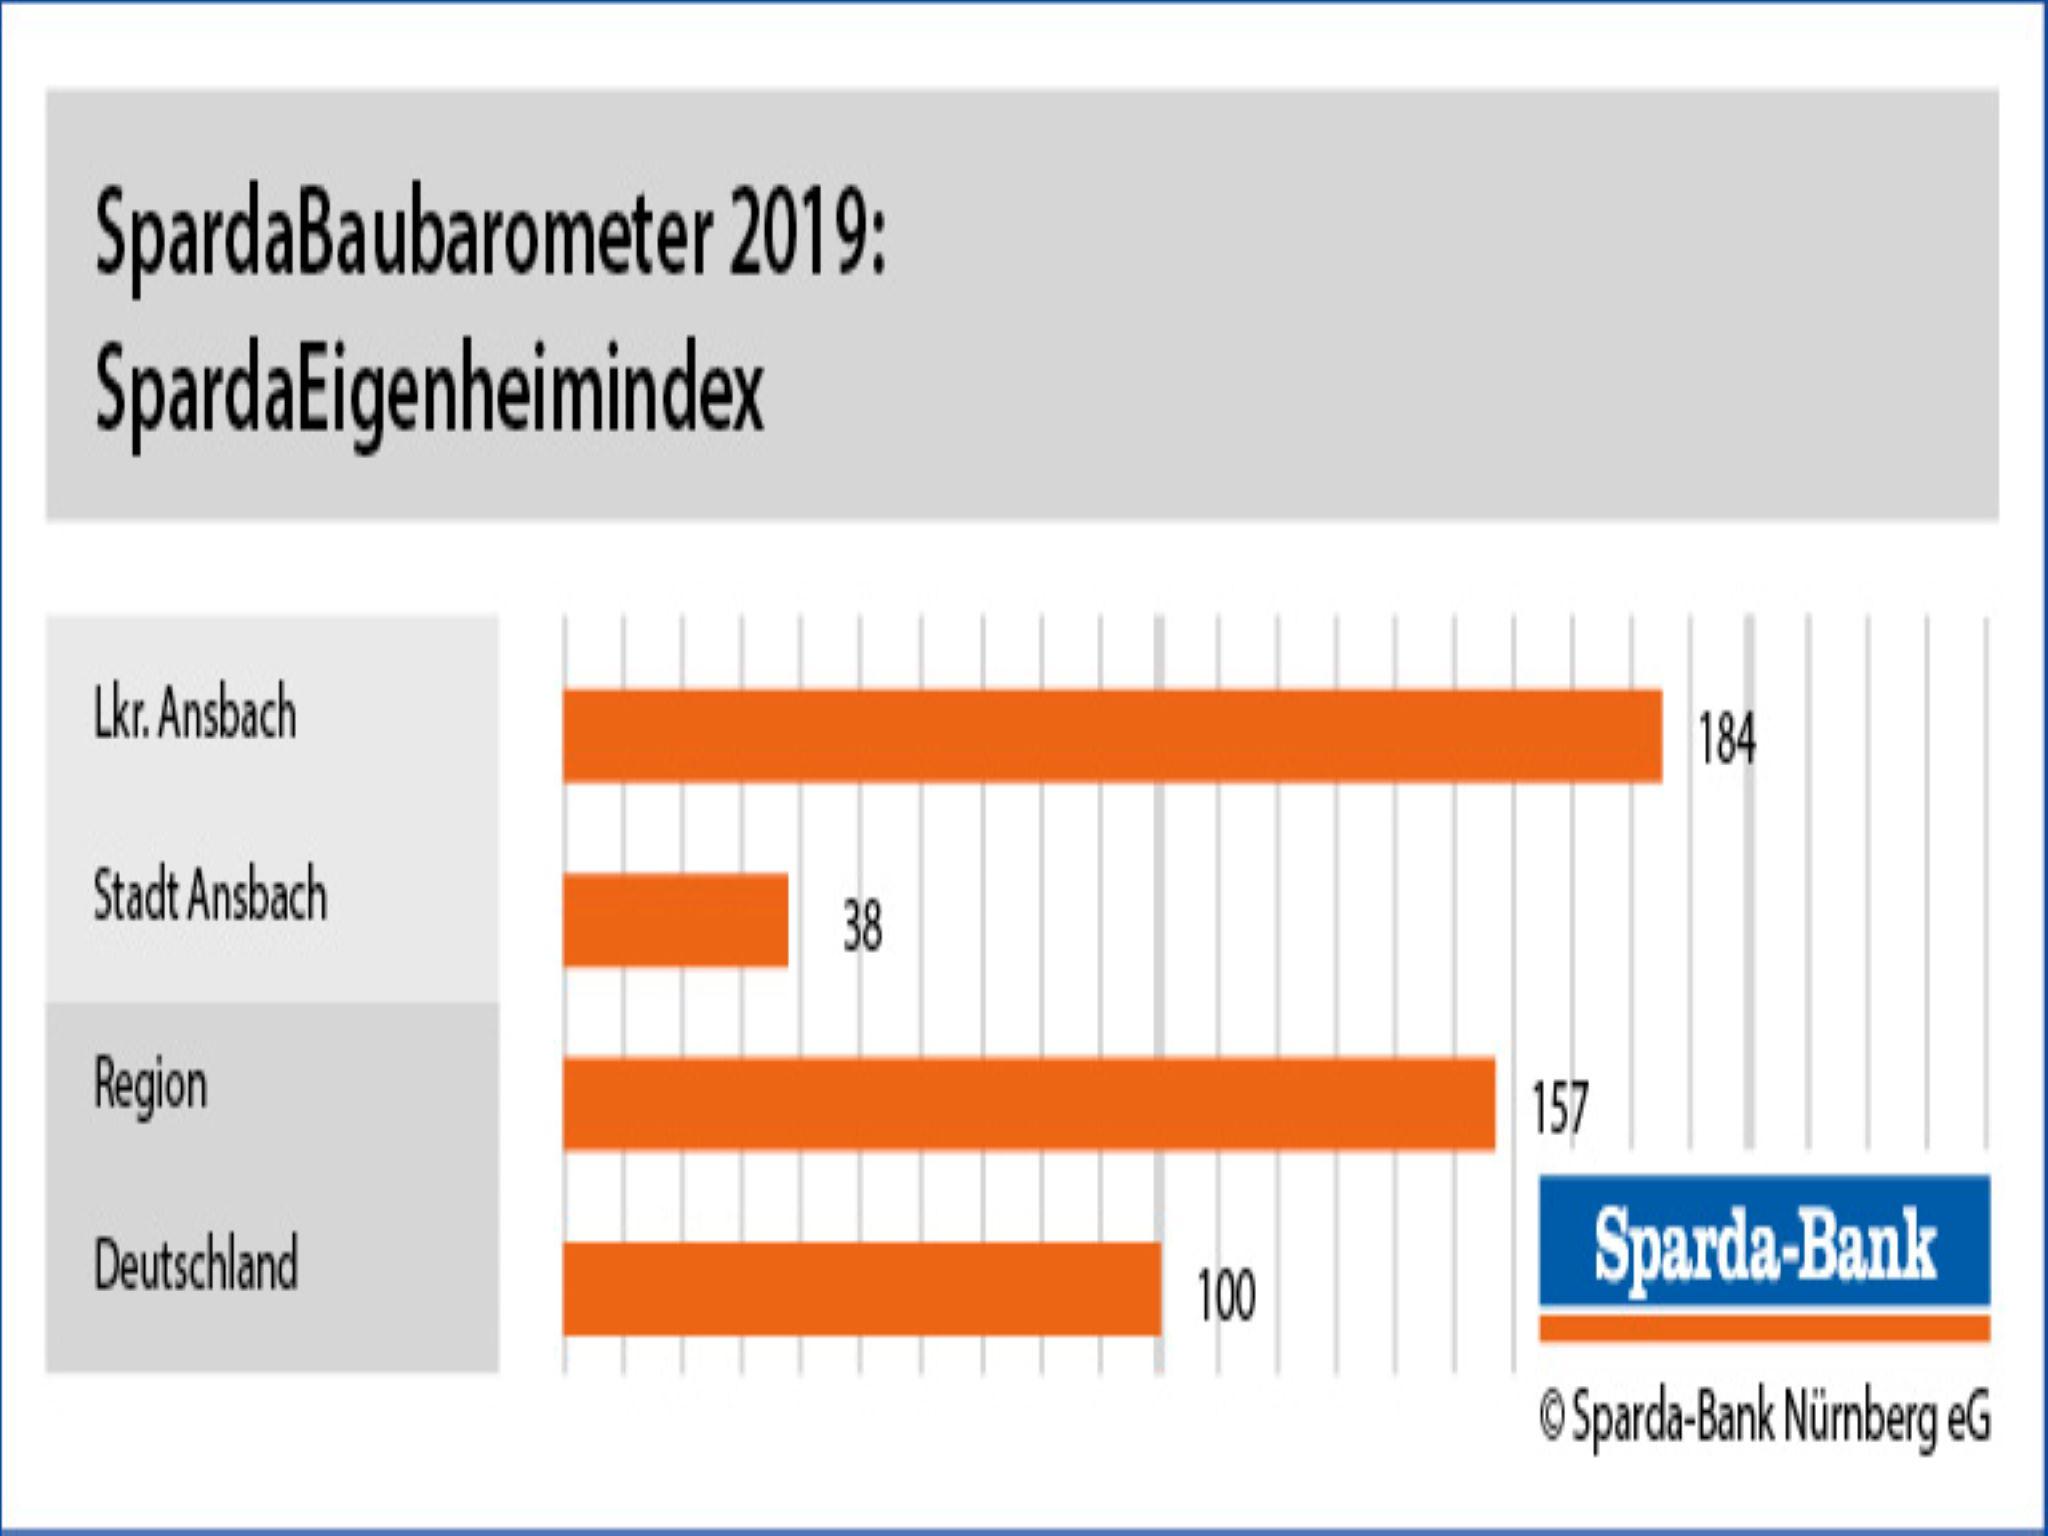 Eigenheimindex Stadt & Landkreis Ansbach; Grafik: Sparda-Bank Nürnberg